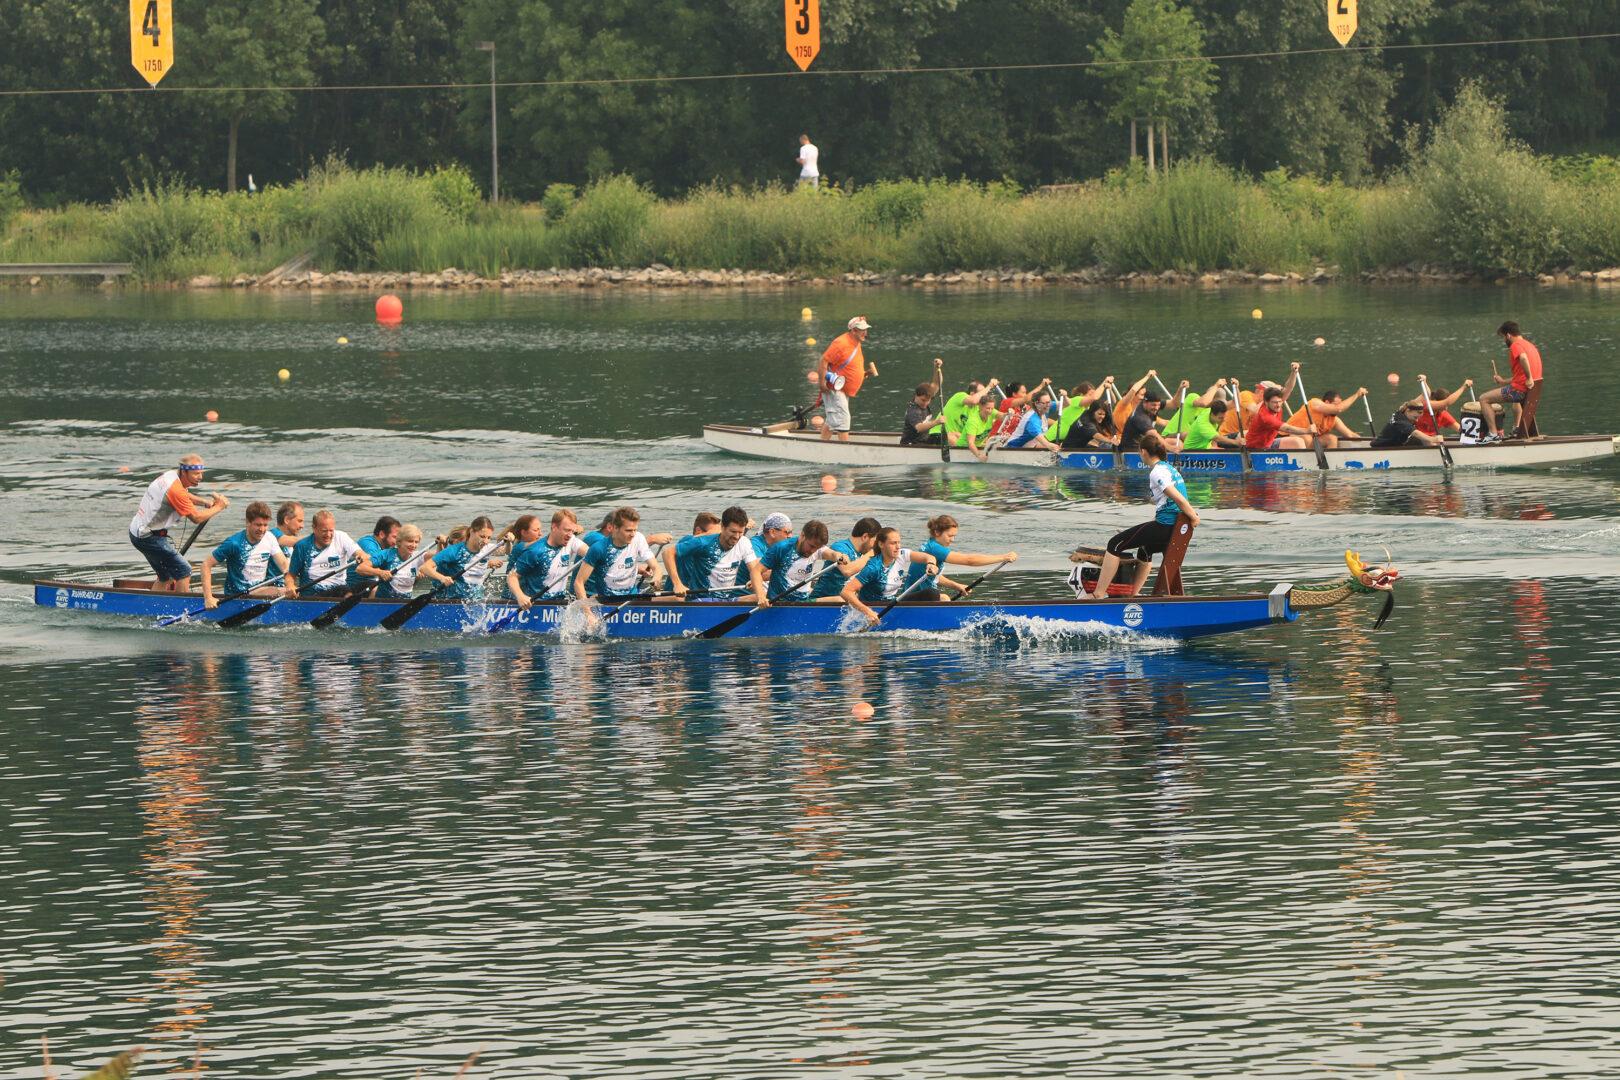 CONET Drachenreiter beim Drachenboot-Festival Fühlinger See Köln 2018